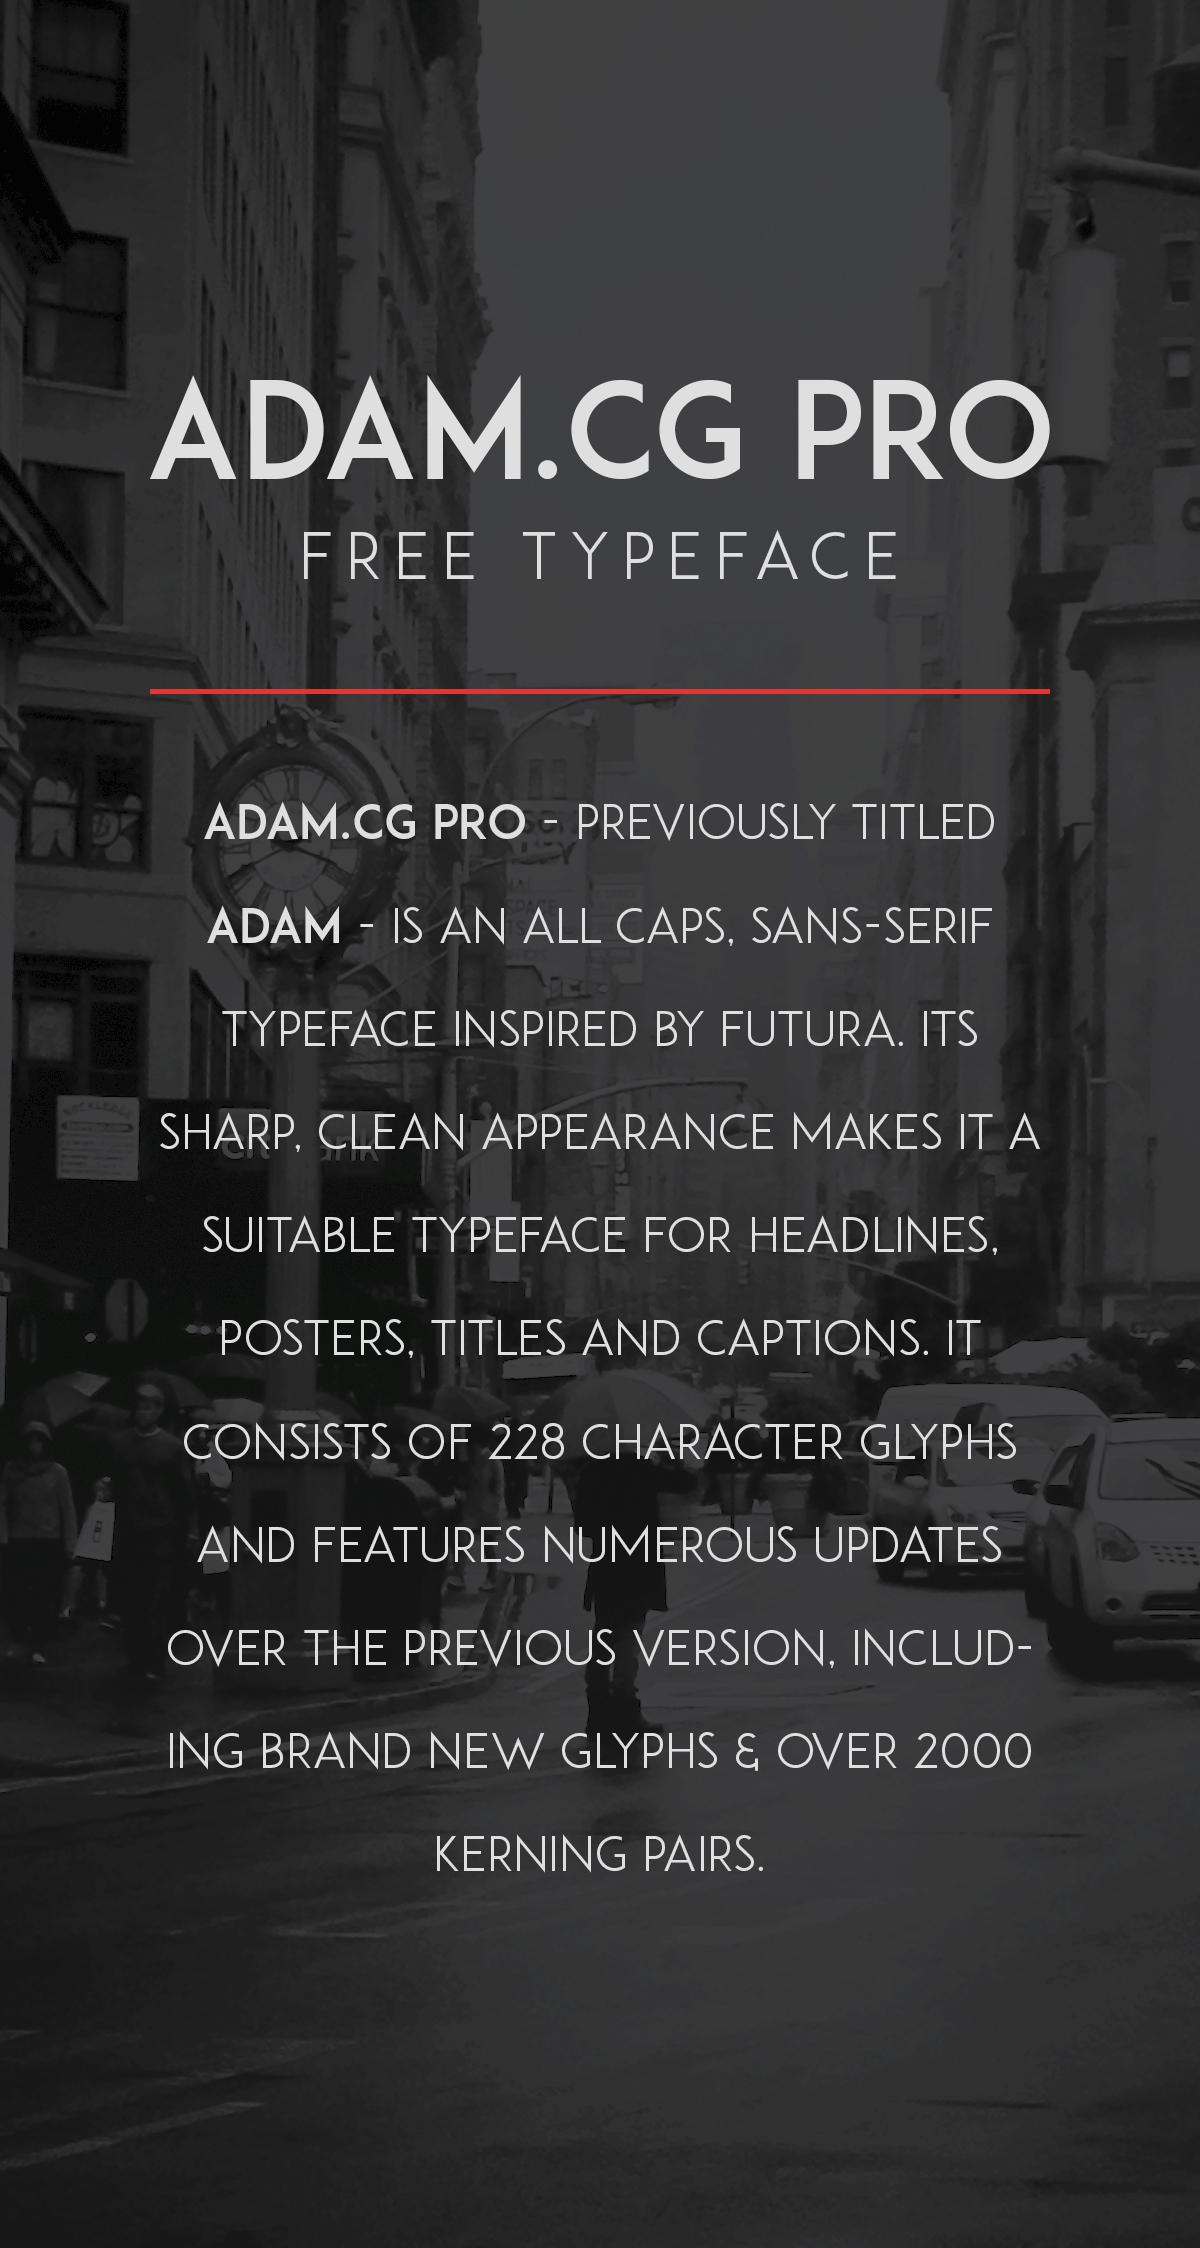 ADAM.CG PRO Free Font - Modern Font